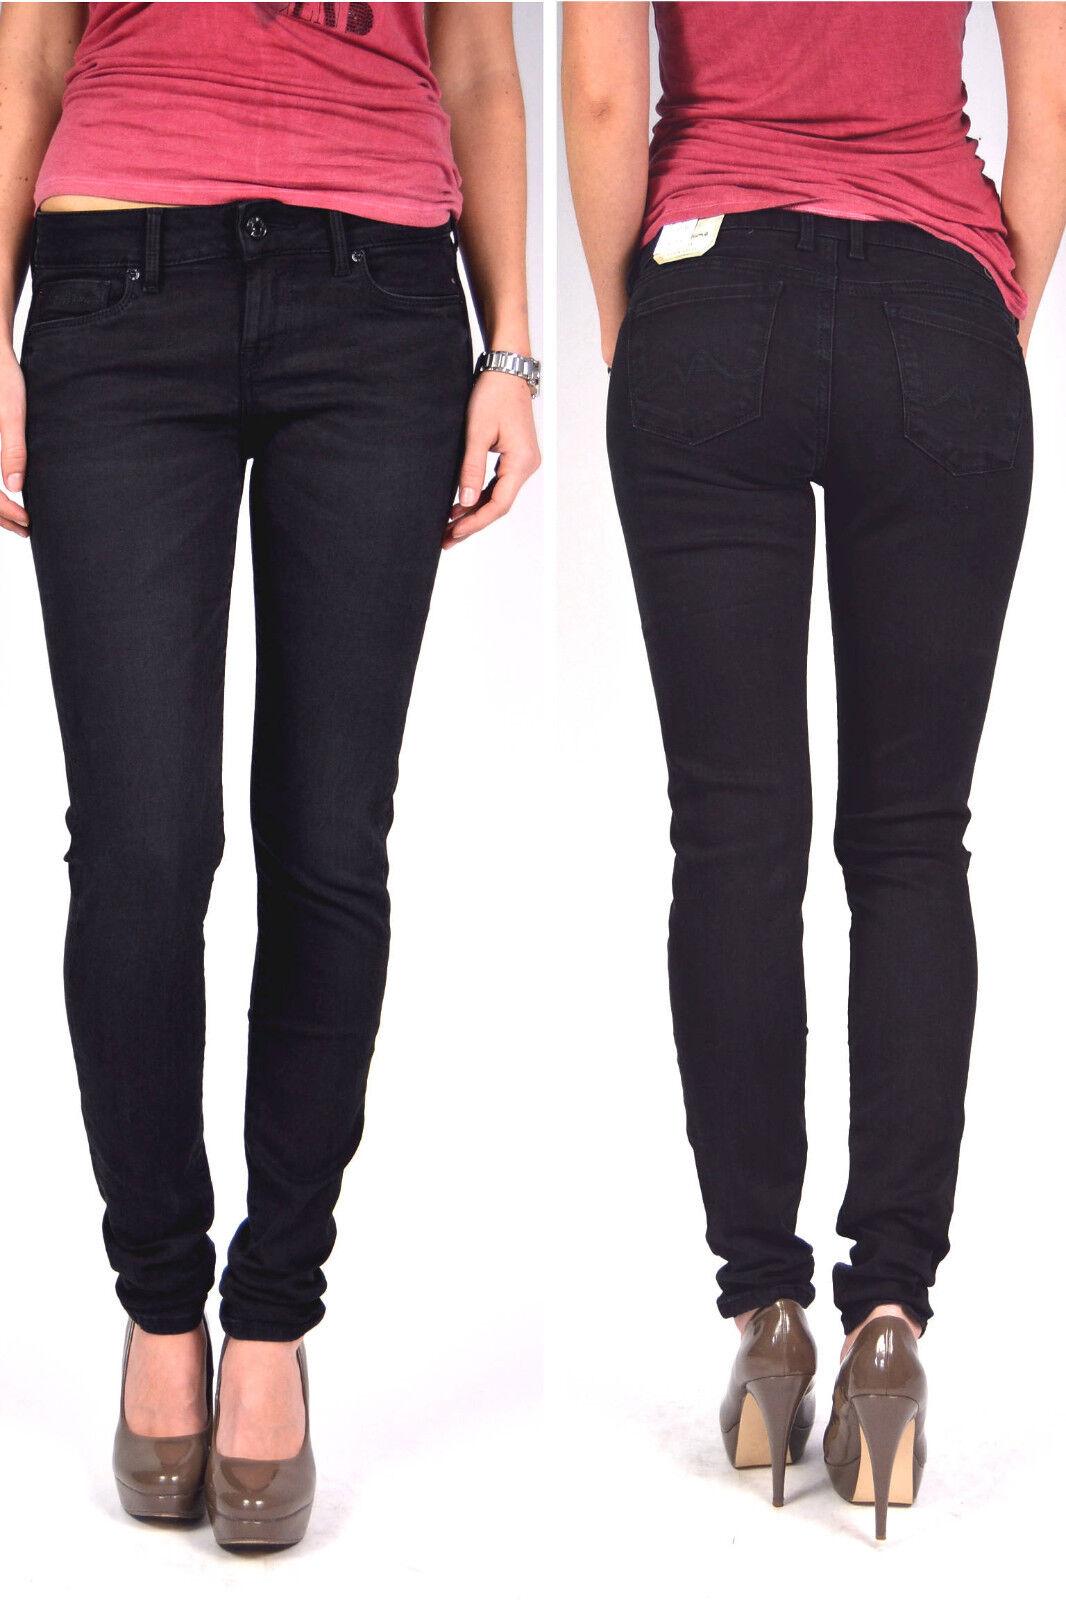 PEPE Jeans Soho s98 NERO REGULAR WAIST WAIST WAIST Skinny Fit Tg. 25 32 - 26 32 - 27 32 a074cf